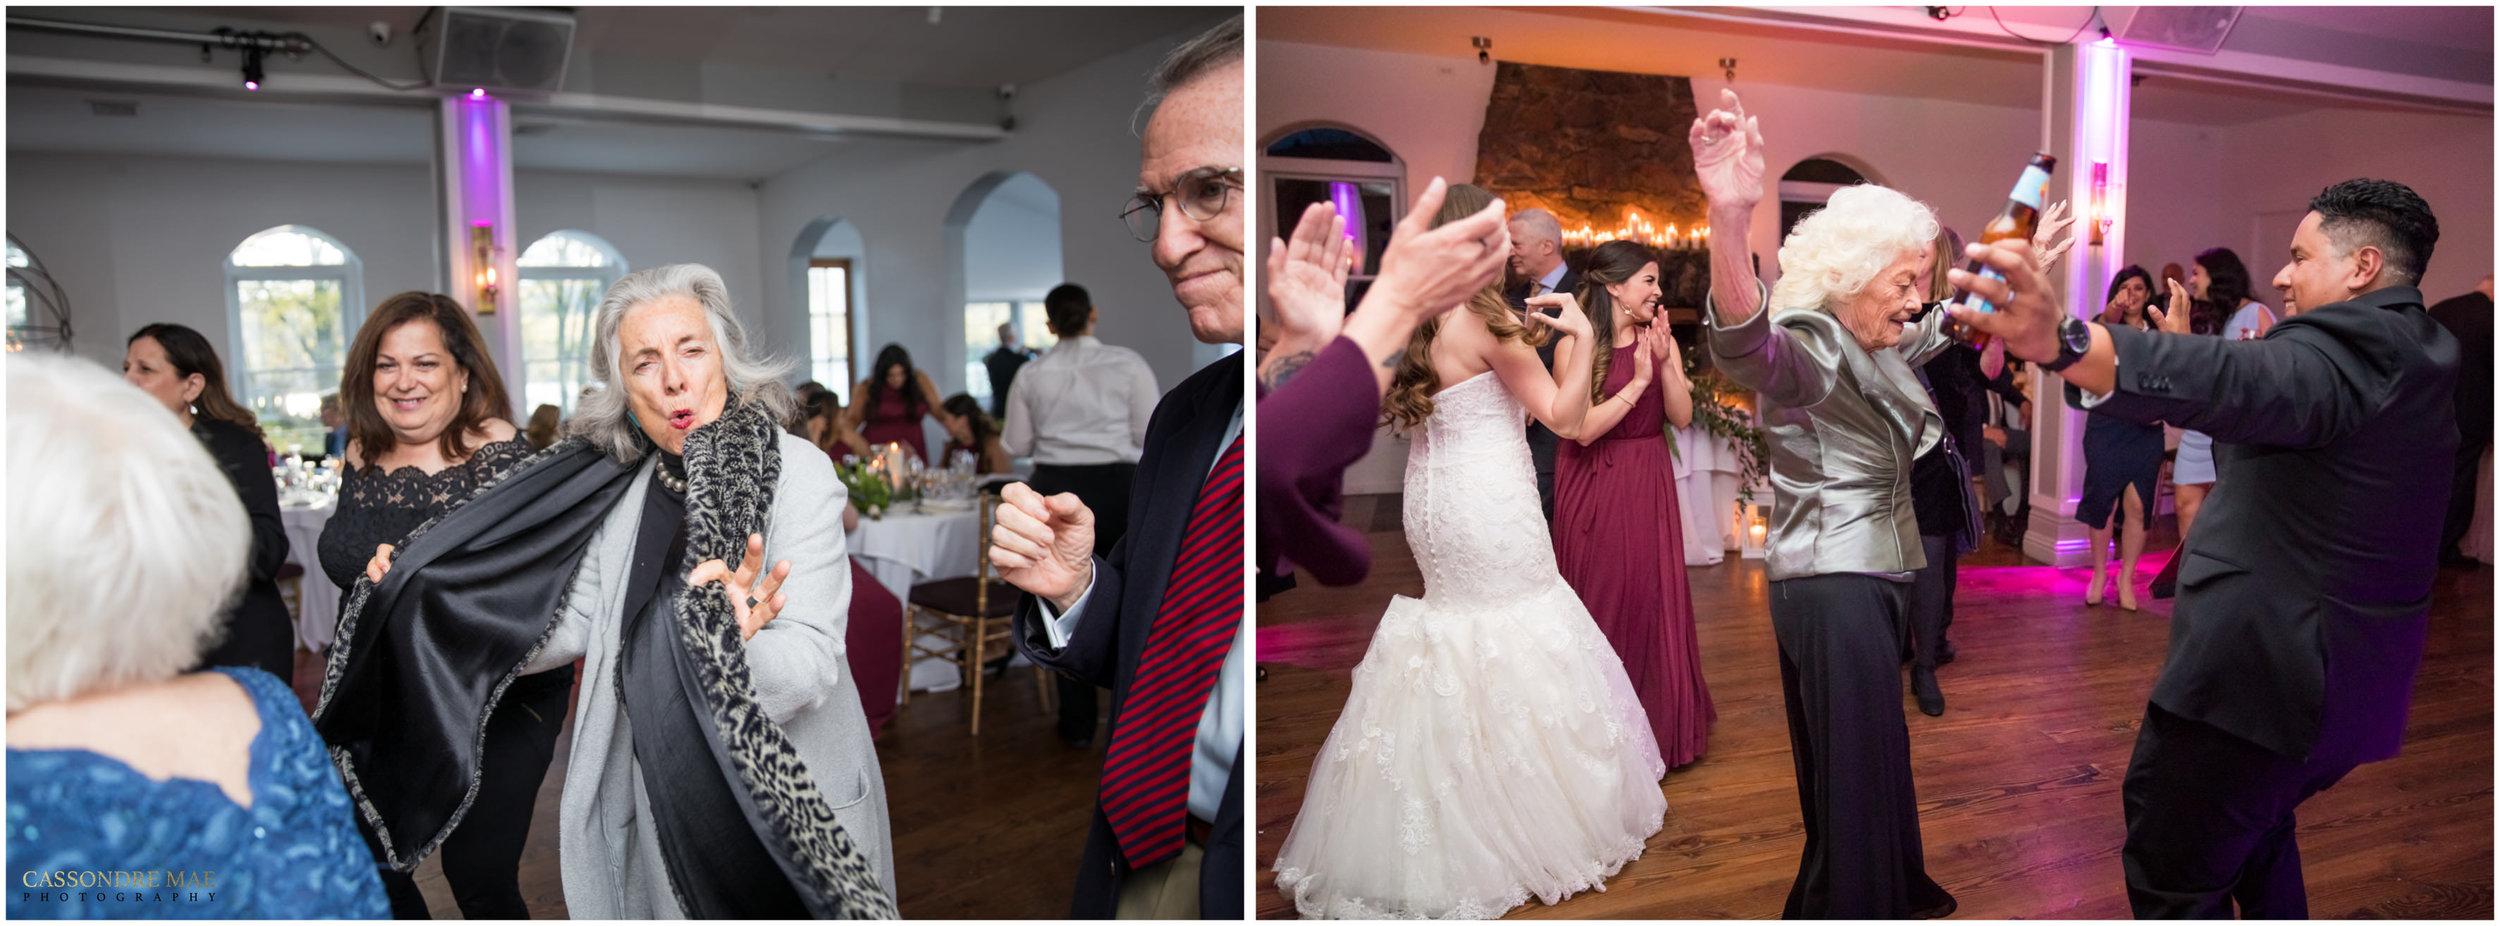 Cassondre Mae Photography Cove Castle Weddings 9.jpg